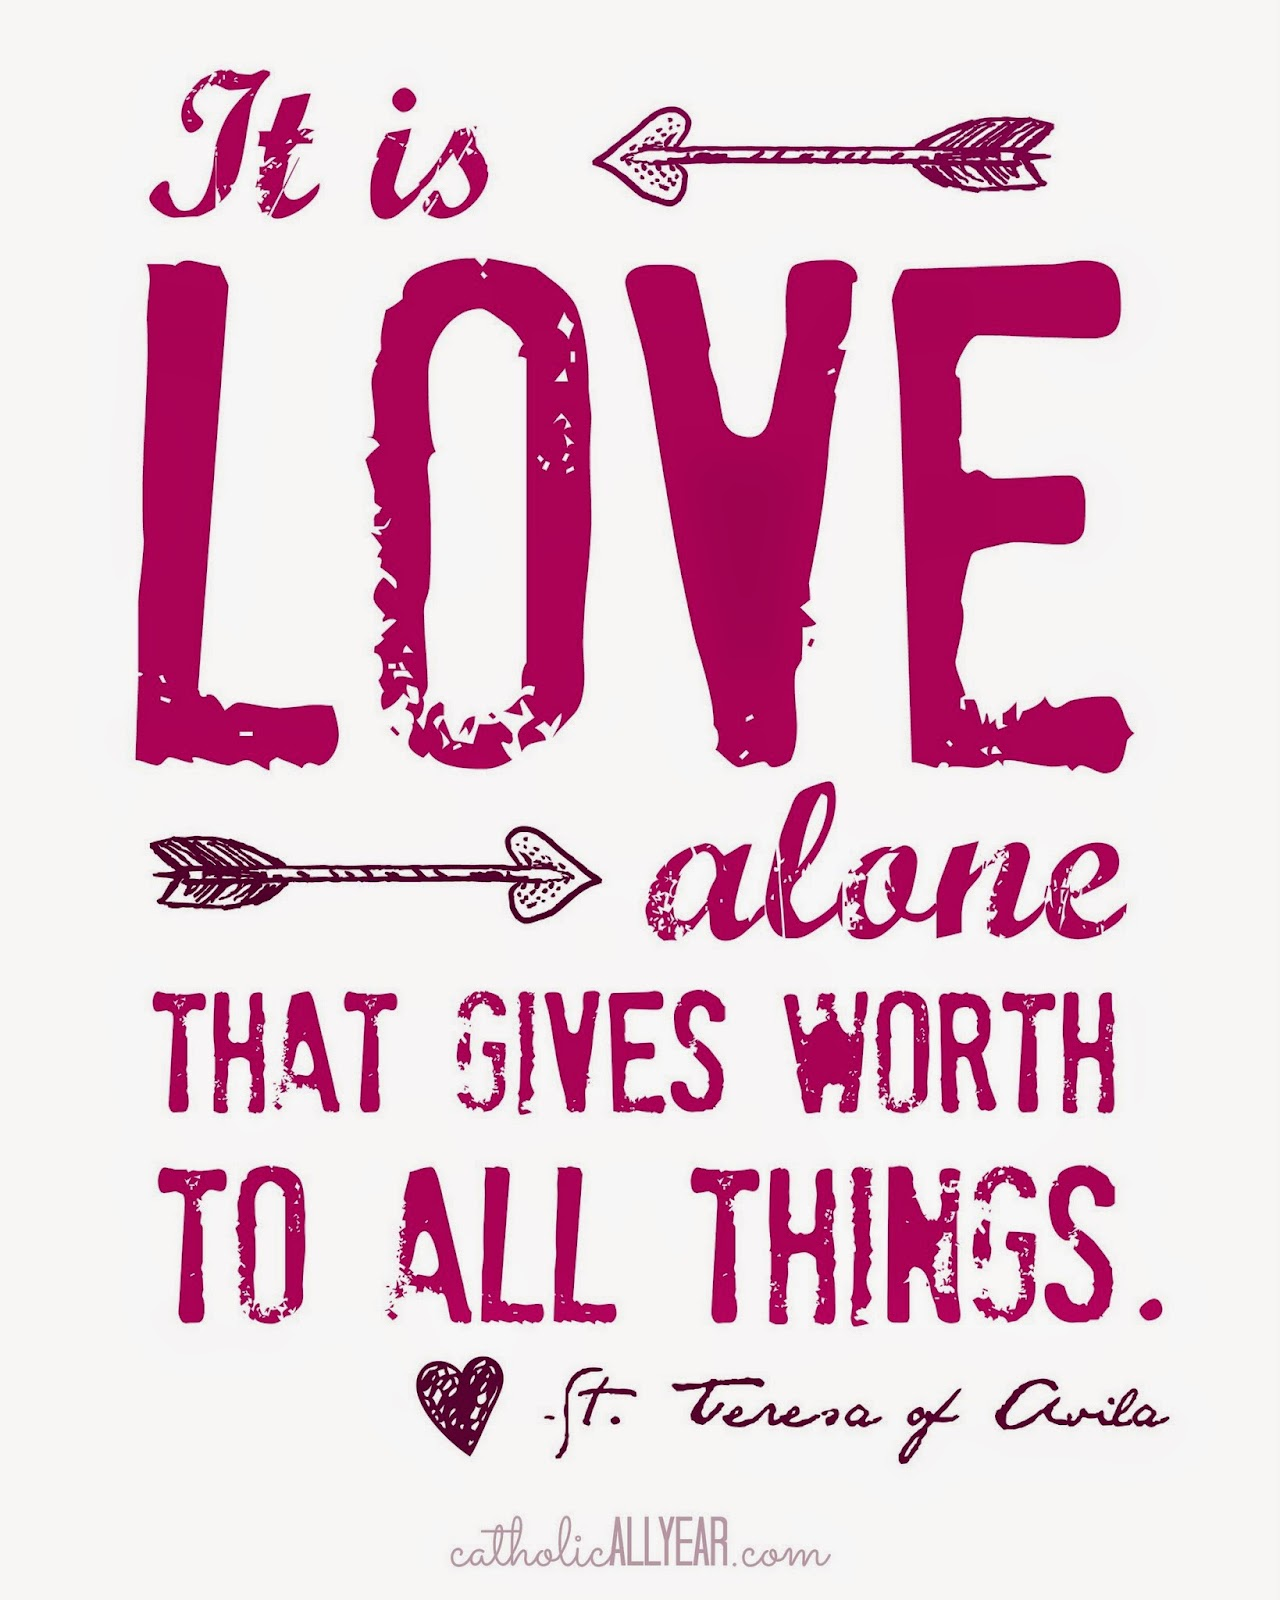 Seven Free Printable Catholic Valentines | Catholic All Year ...